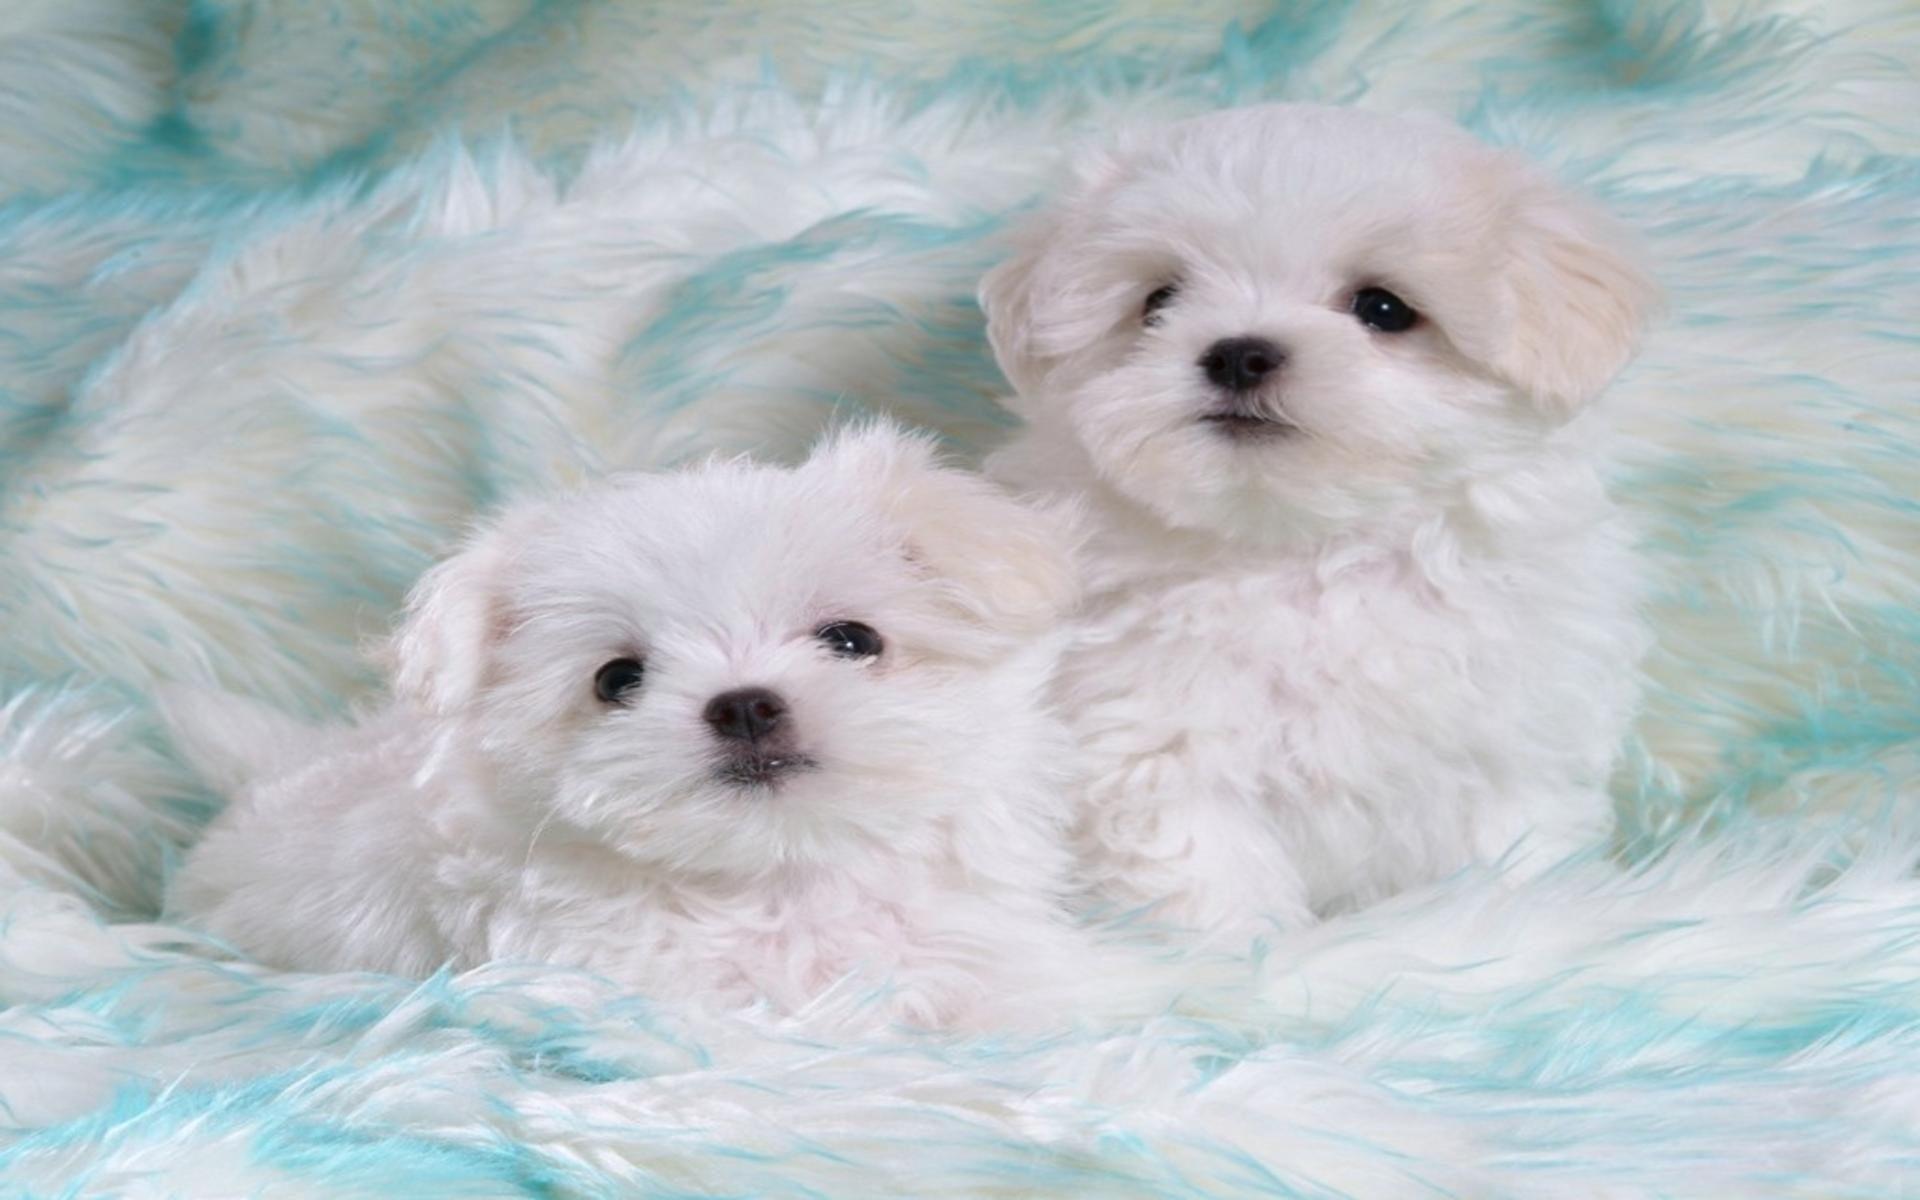 Cute White Puppies 543552